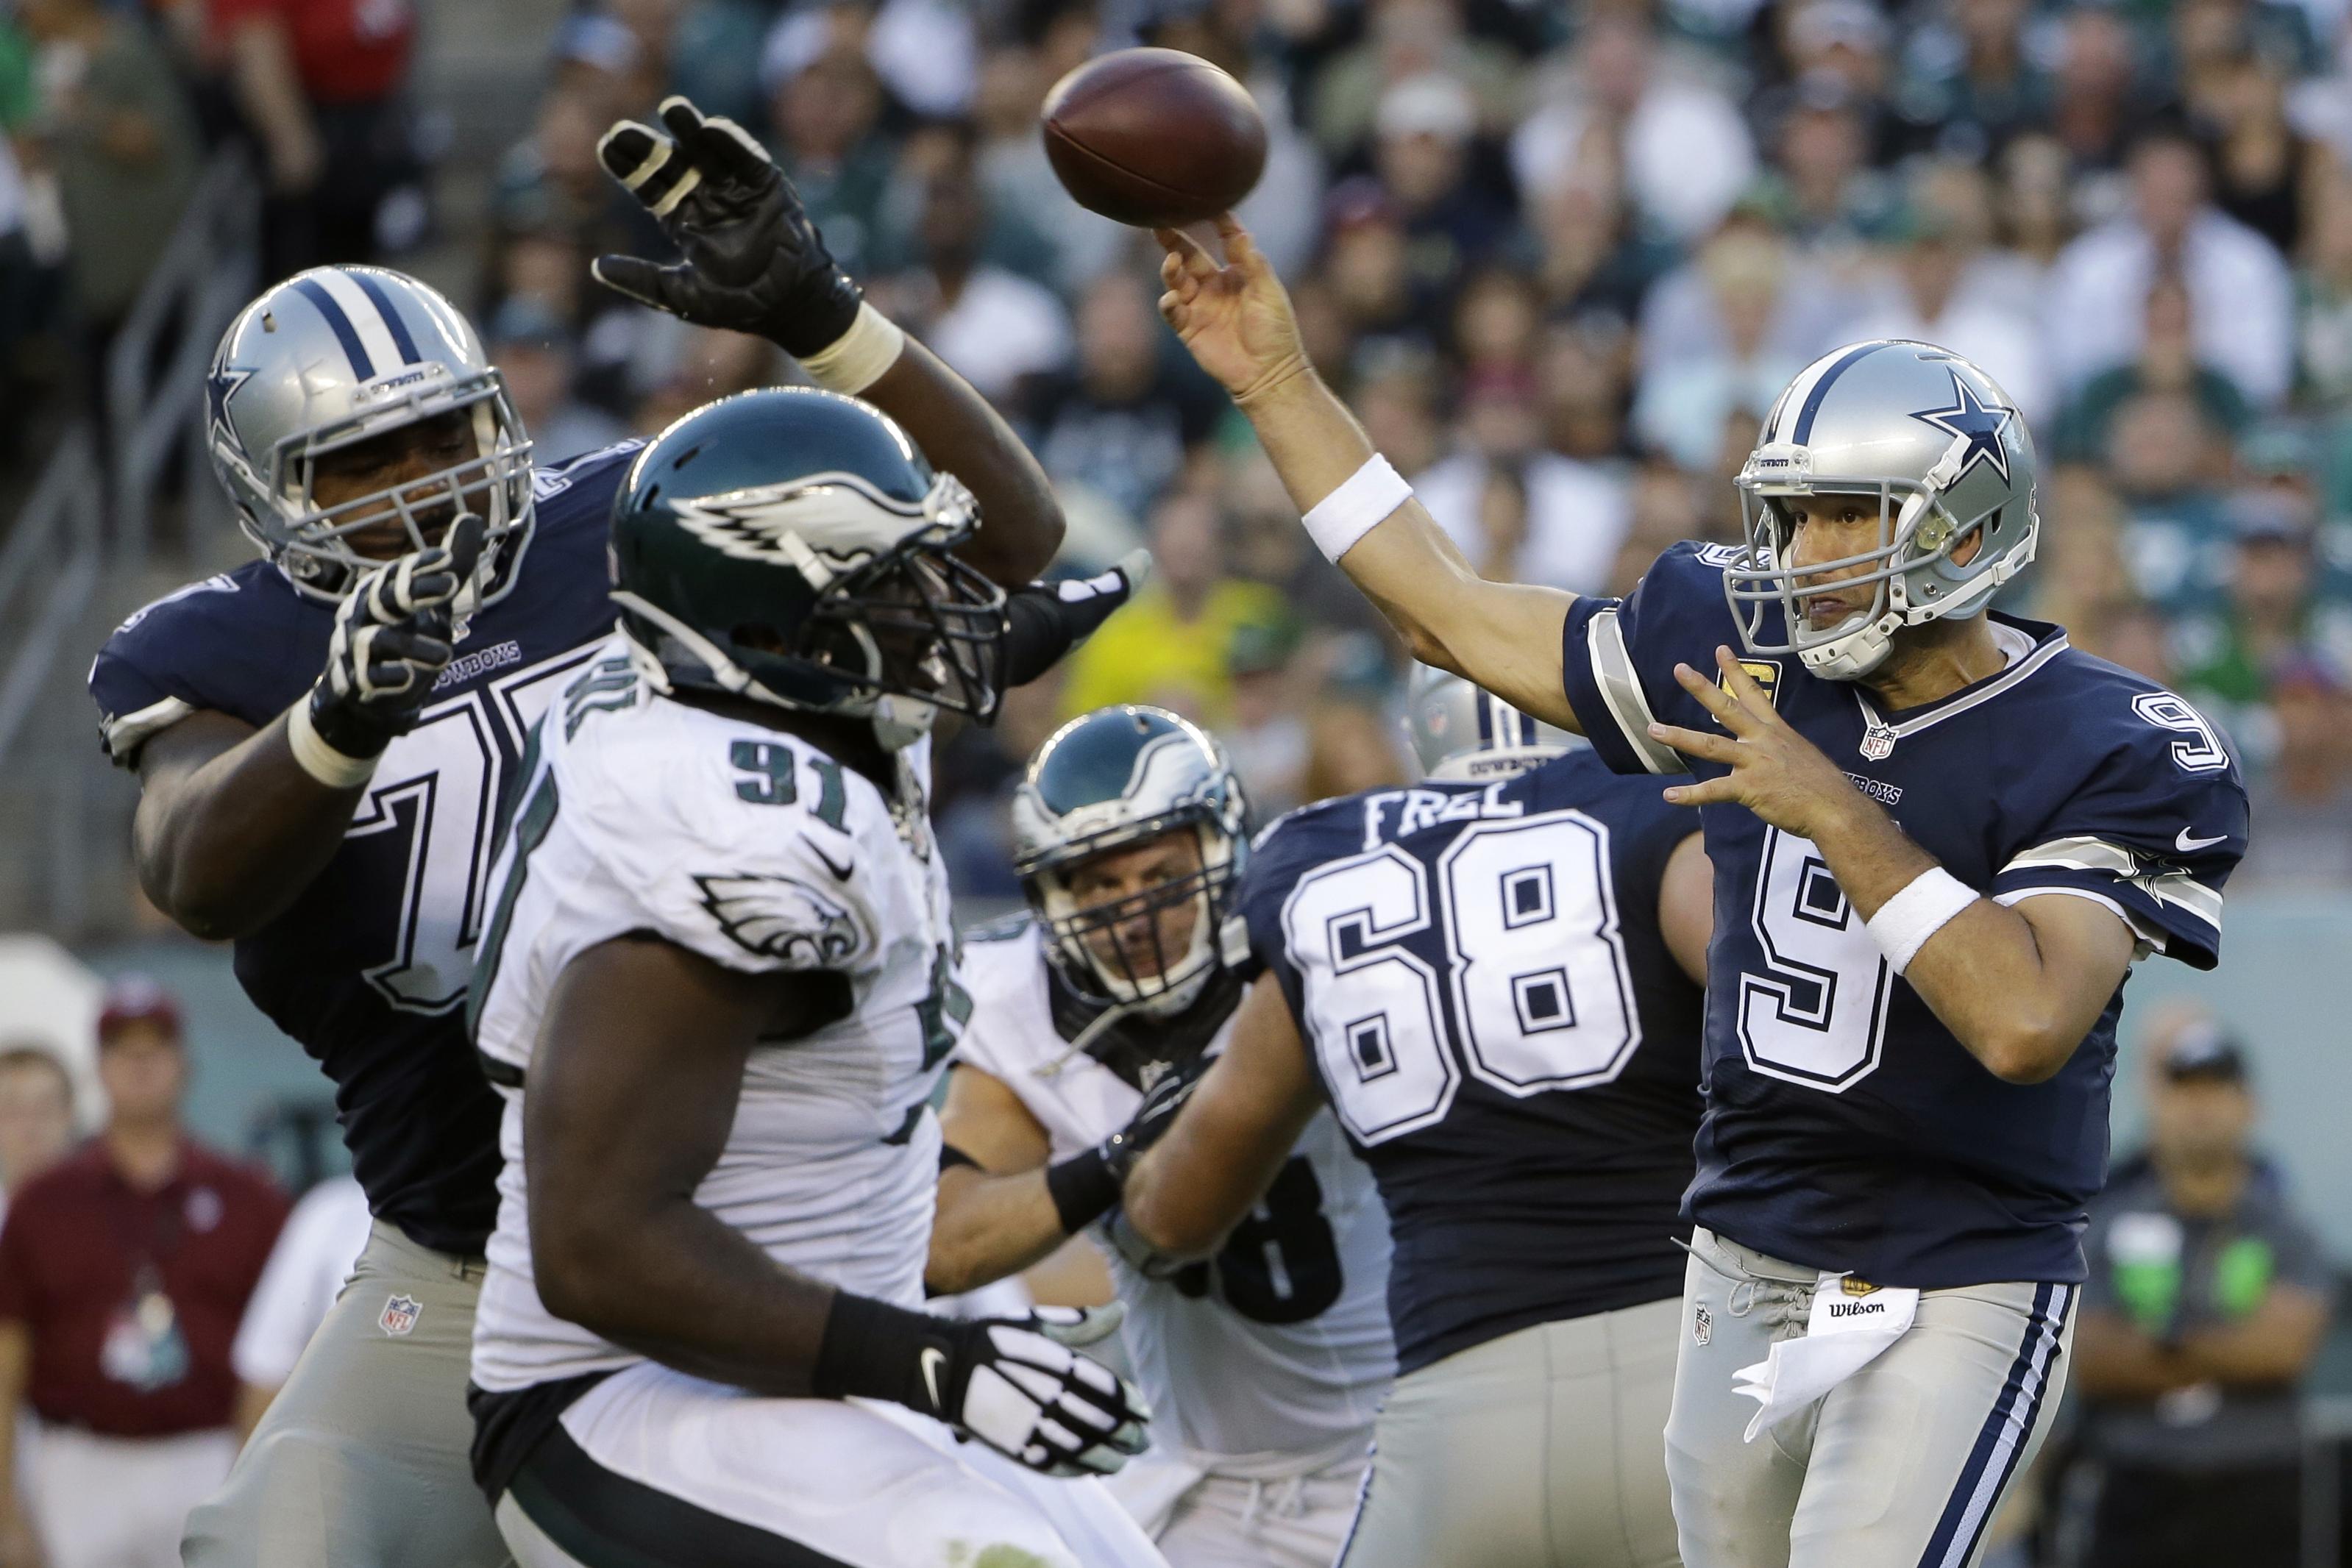 Dallas Cowboys' Tony Romo passes during the second half of an NFL football game against the Philadelphia Eagles, Sunday, Sept. 20, 2015, in Philadelphia. (AP Photo/Matt Rourke)